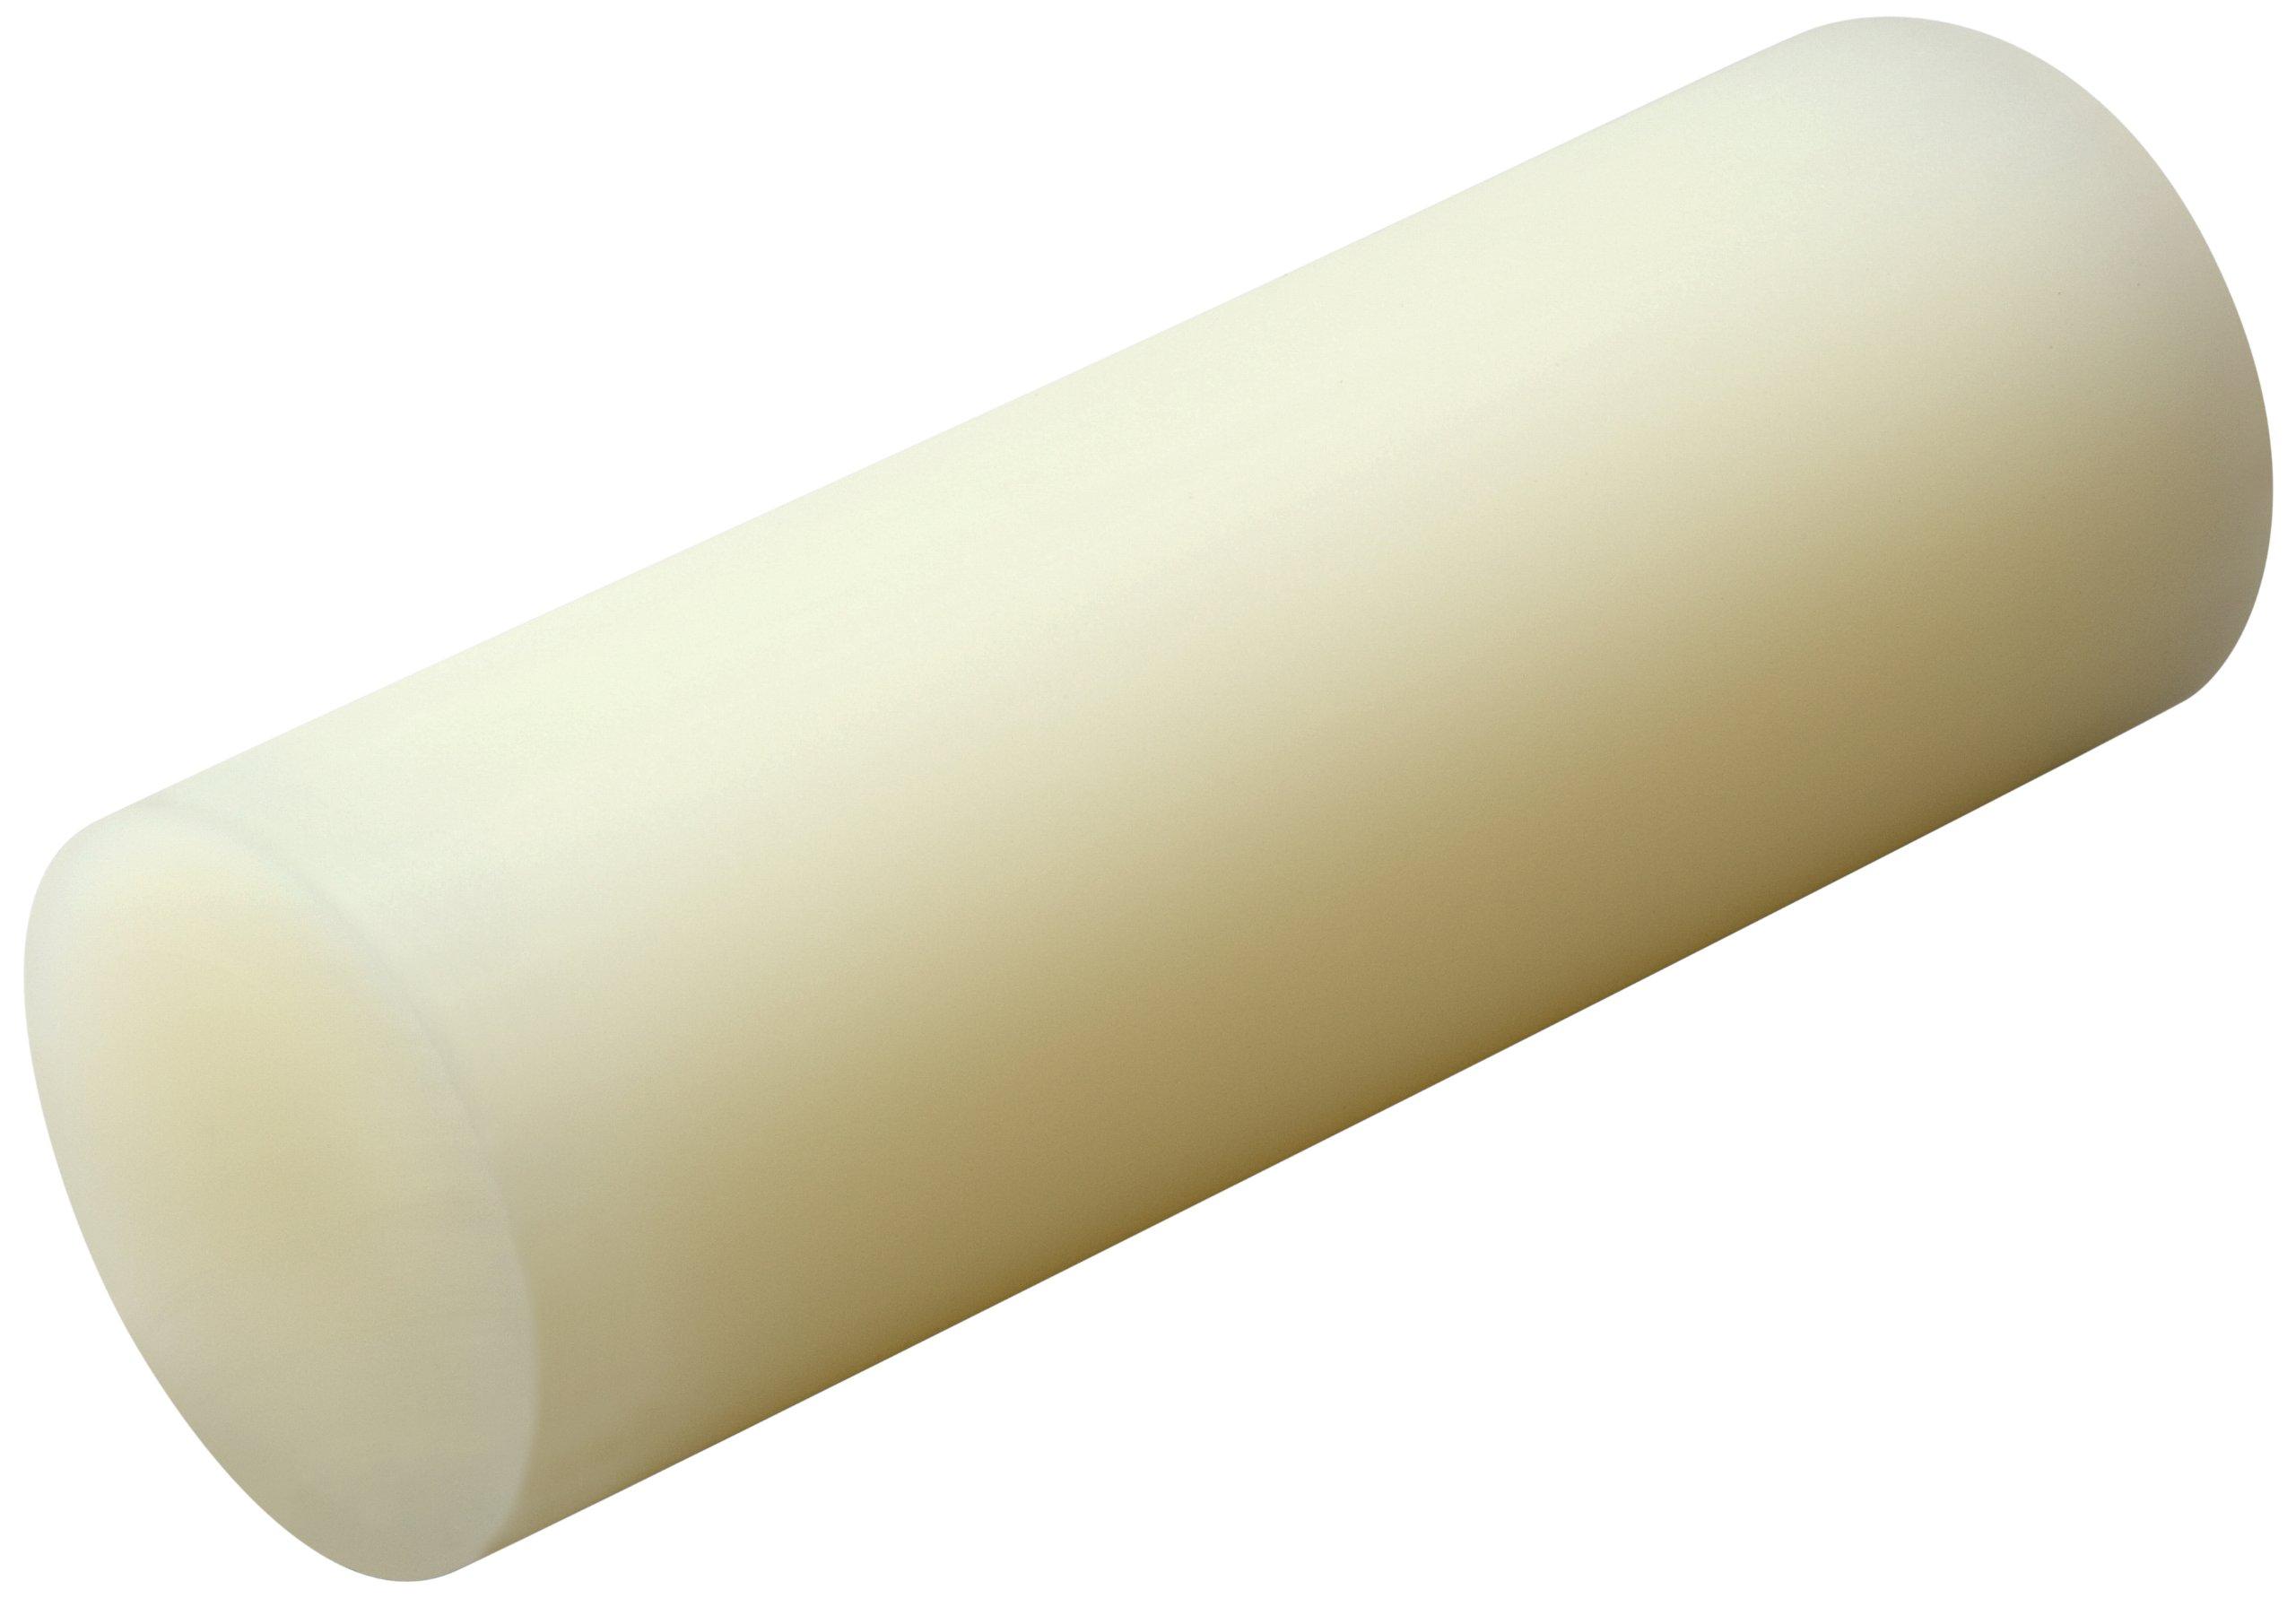 3M 3748PG Off White Hot Melt Adhesive, 1'' x 3'', 22 Pounds